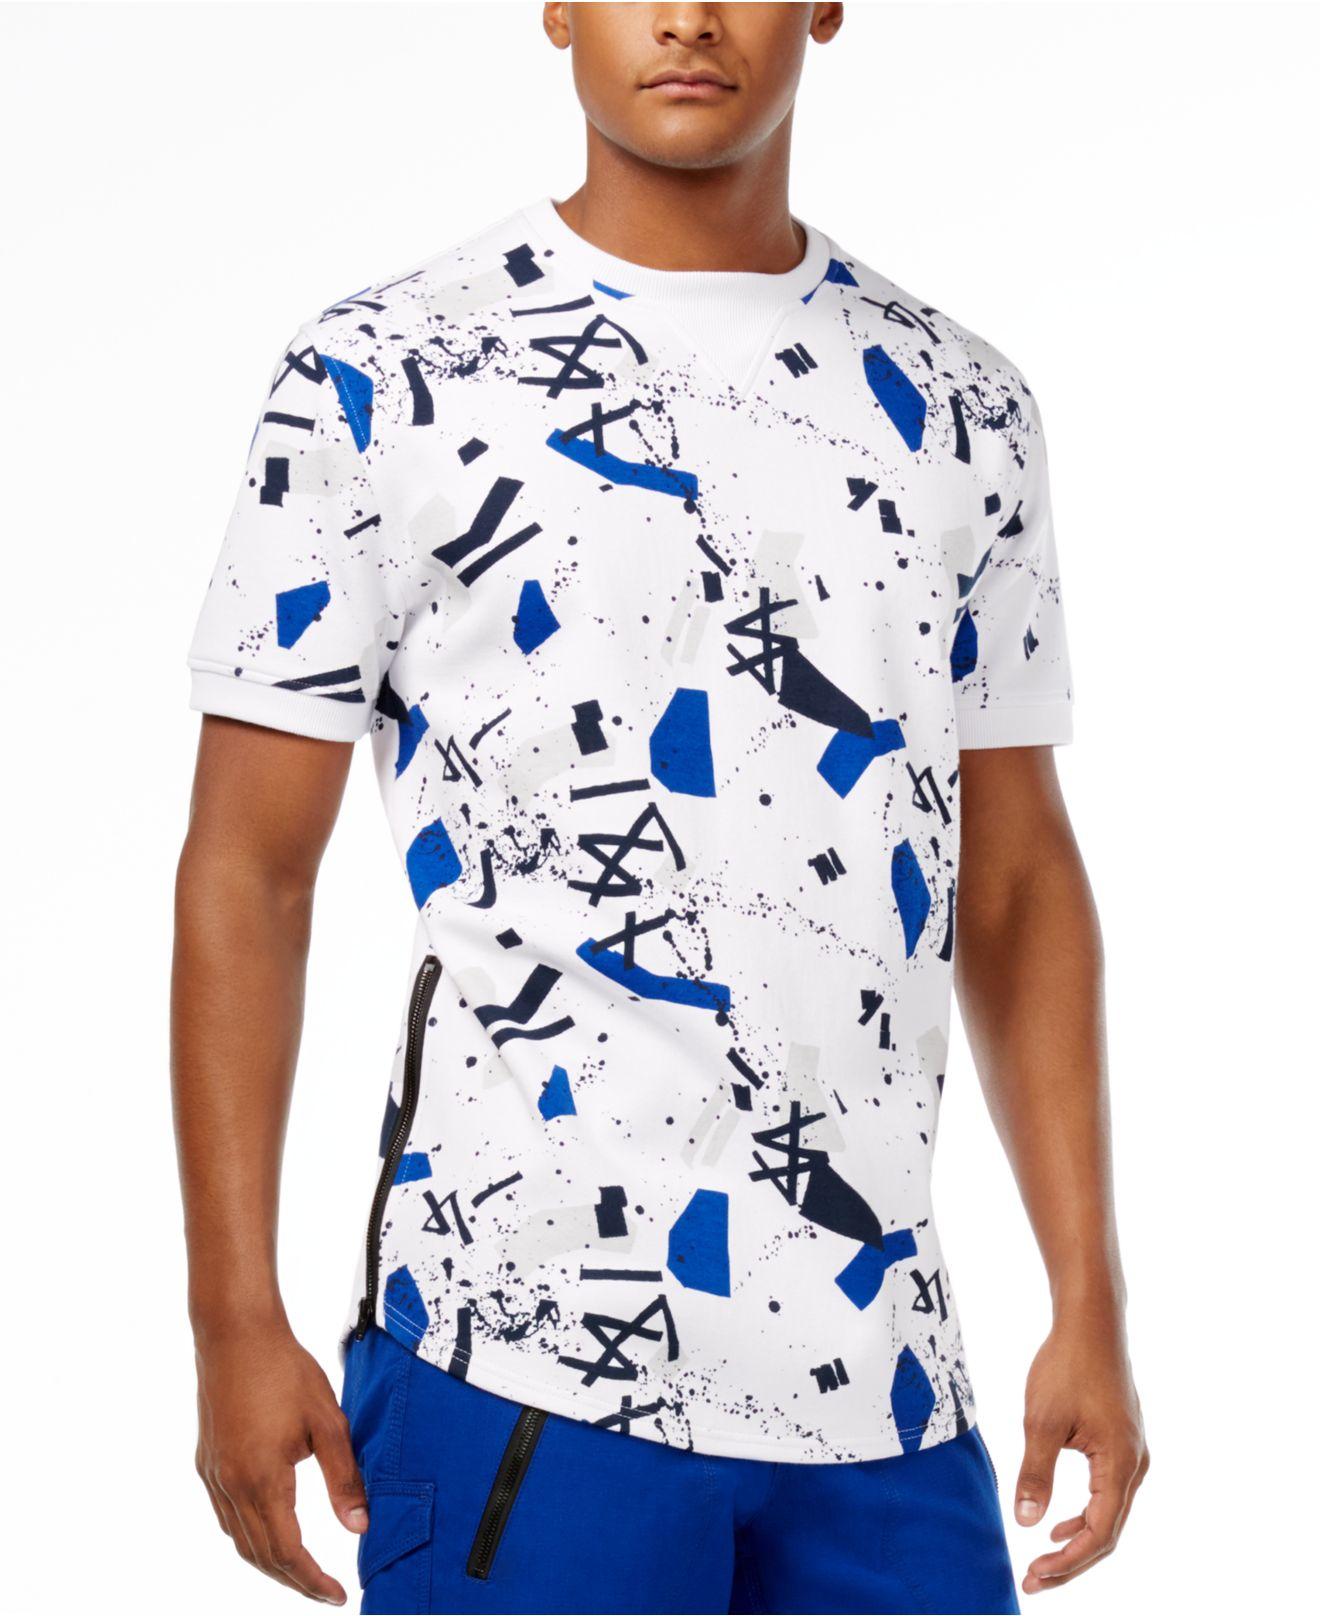 Sean john men 39 s graffiti print t shirt in blue for men for Sean john t shirts for mens